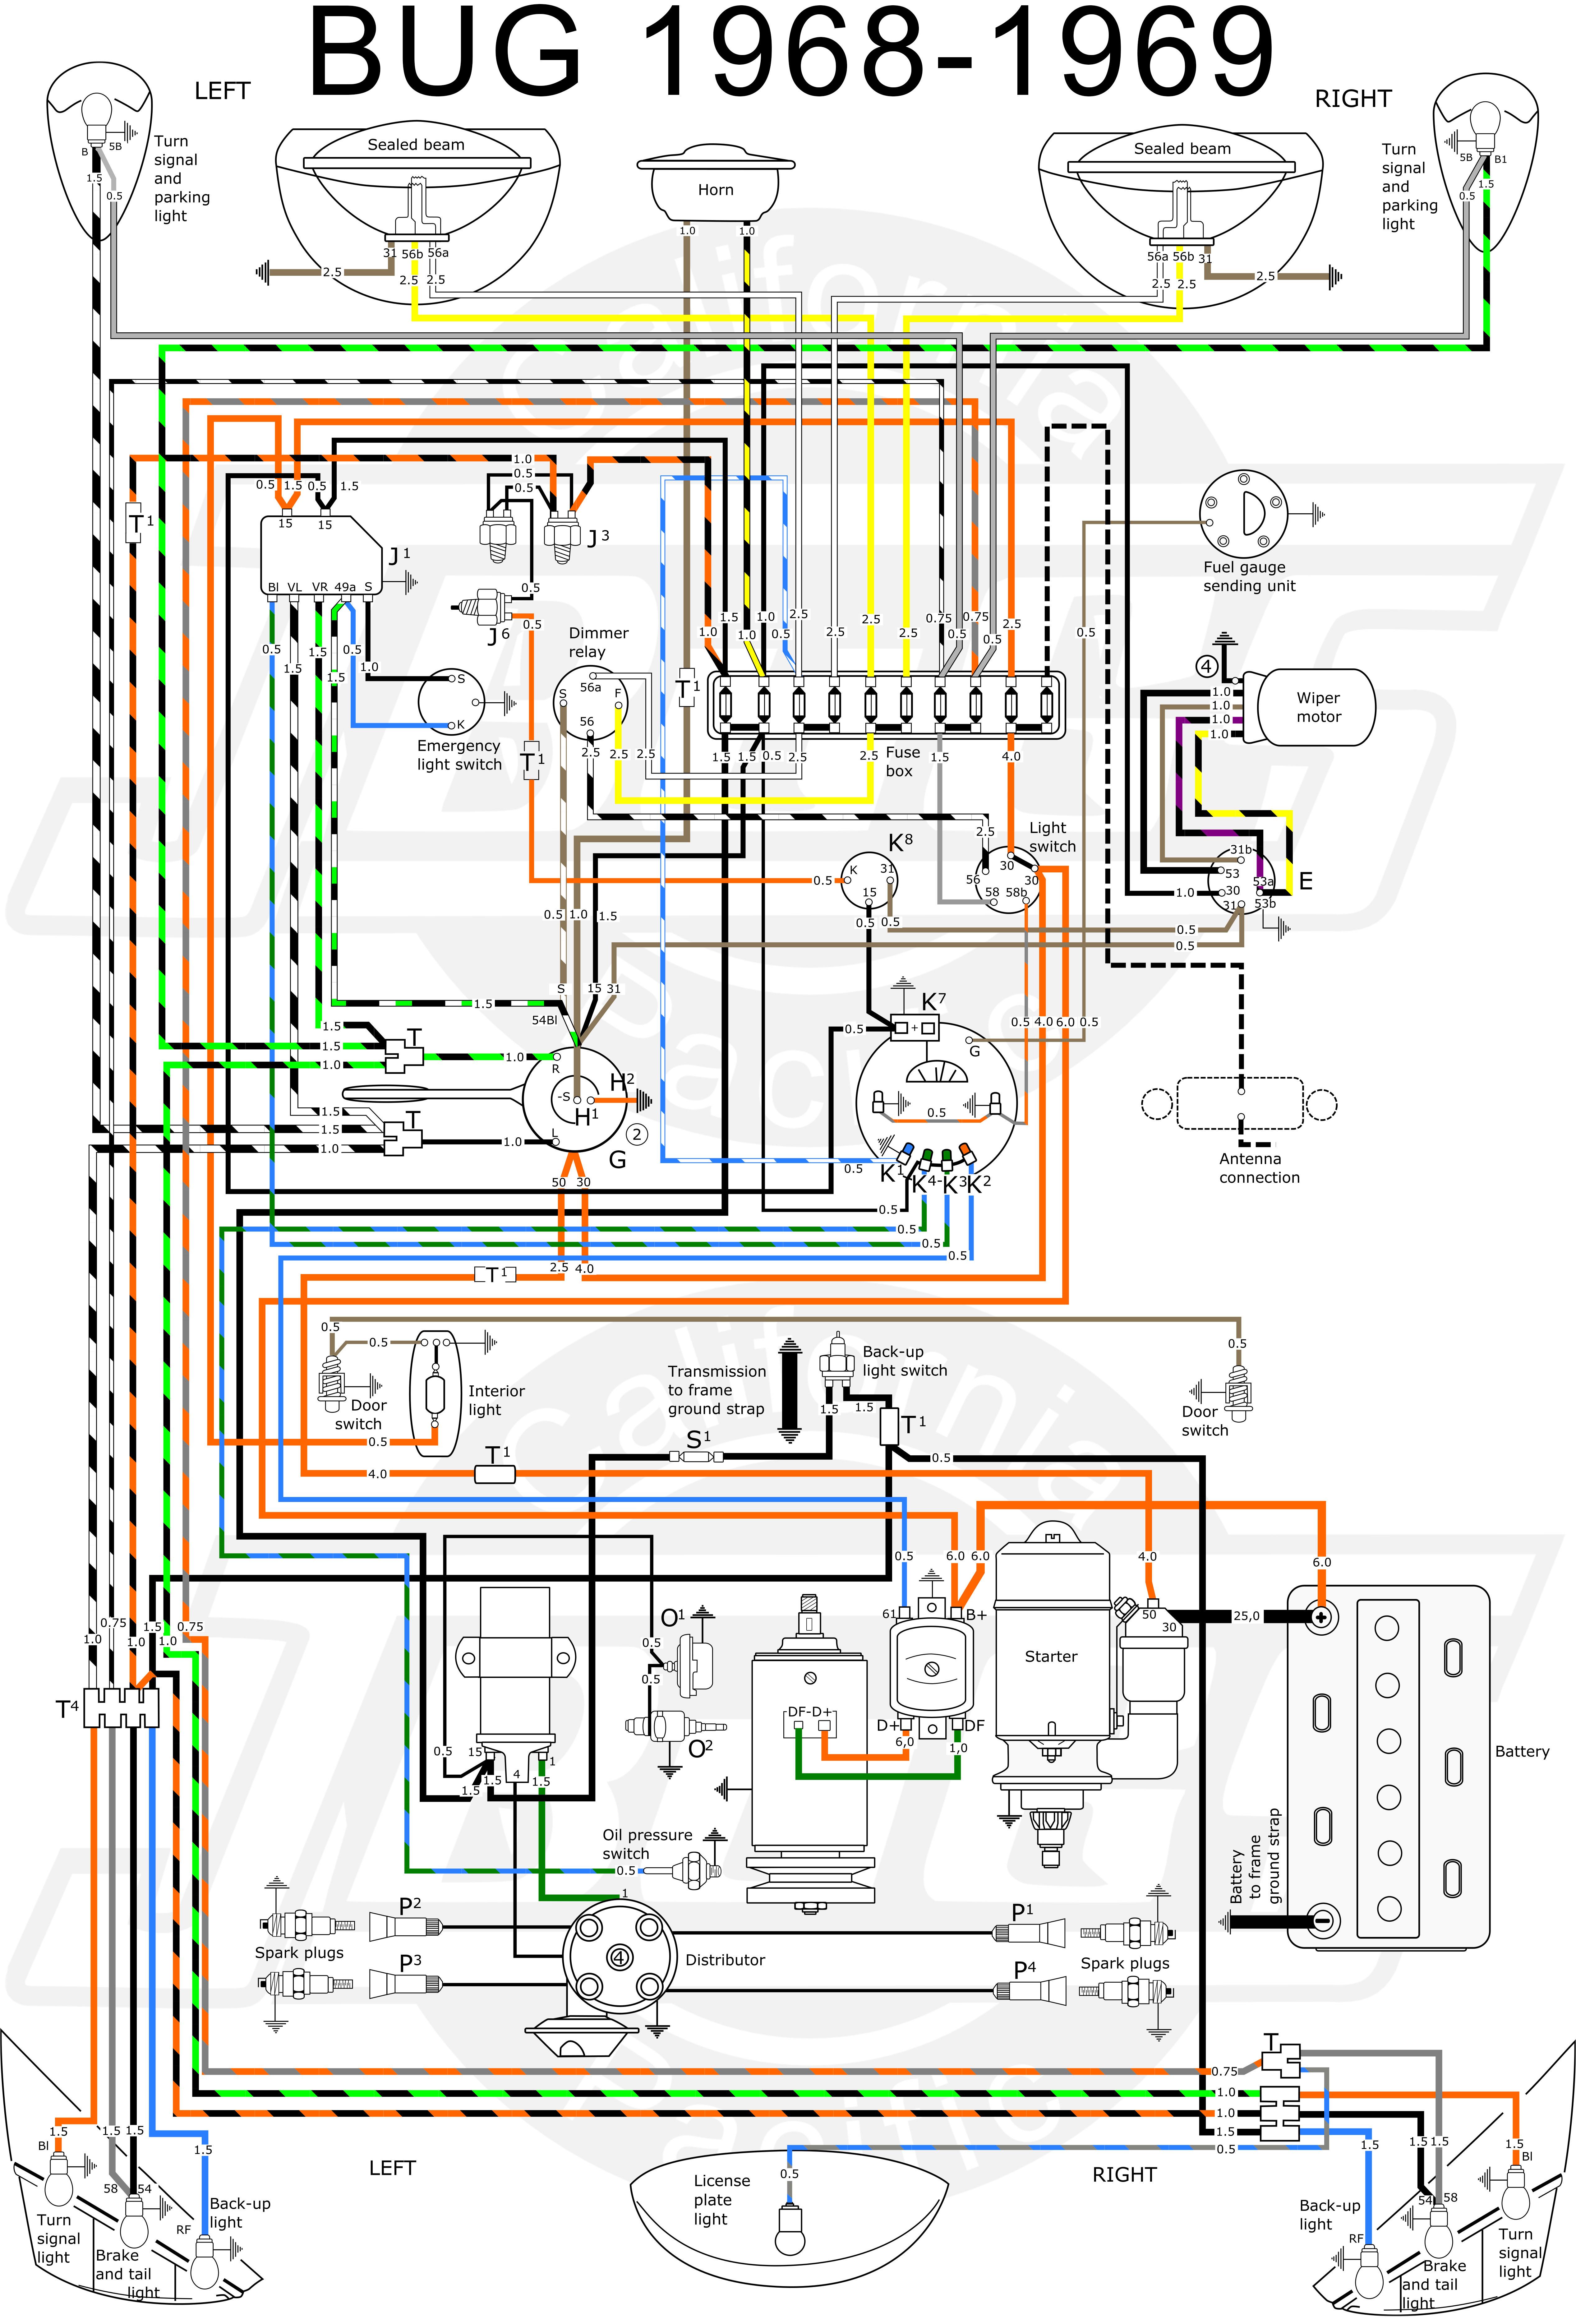 Beetle 1600 Wiring Diagram Vw Tech Article 1968-69 Wiring Diagram Of Beetle 1600 Wiring Diagram